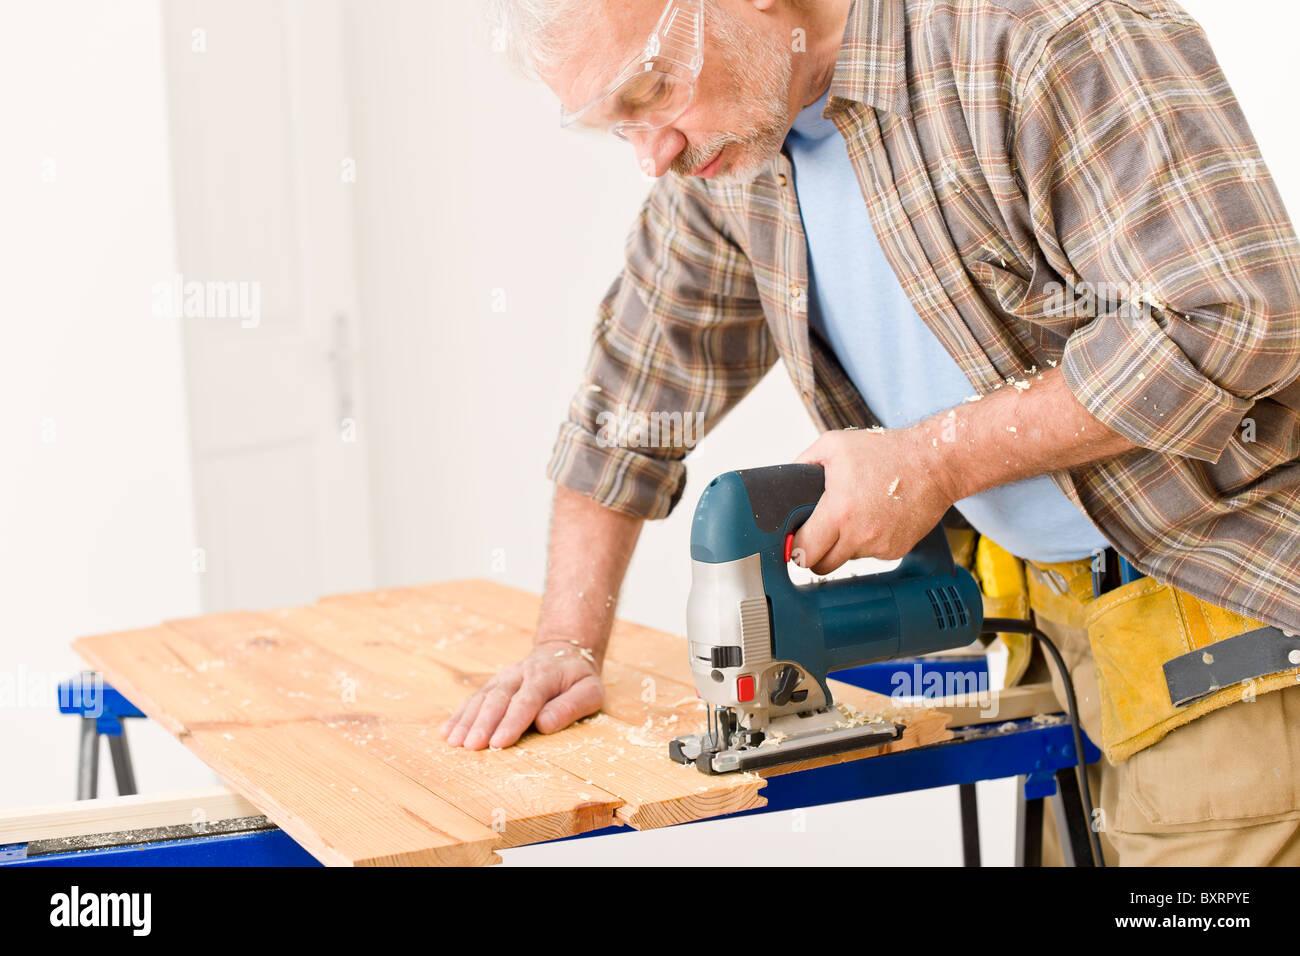 Home improvement - handyman cut wood with jigsaw in workshop Stock Photo